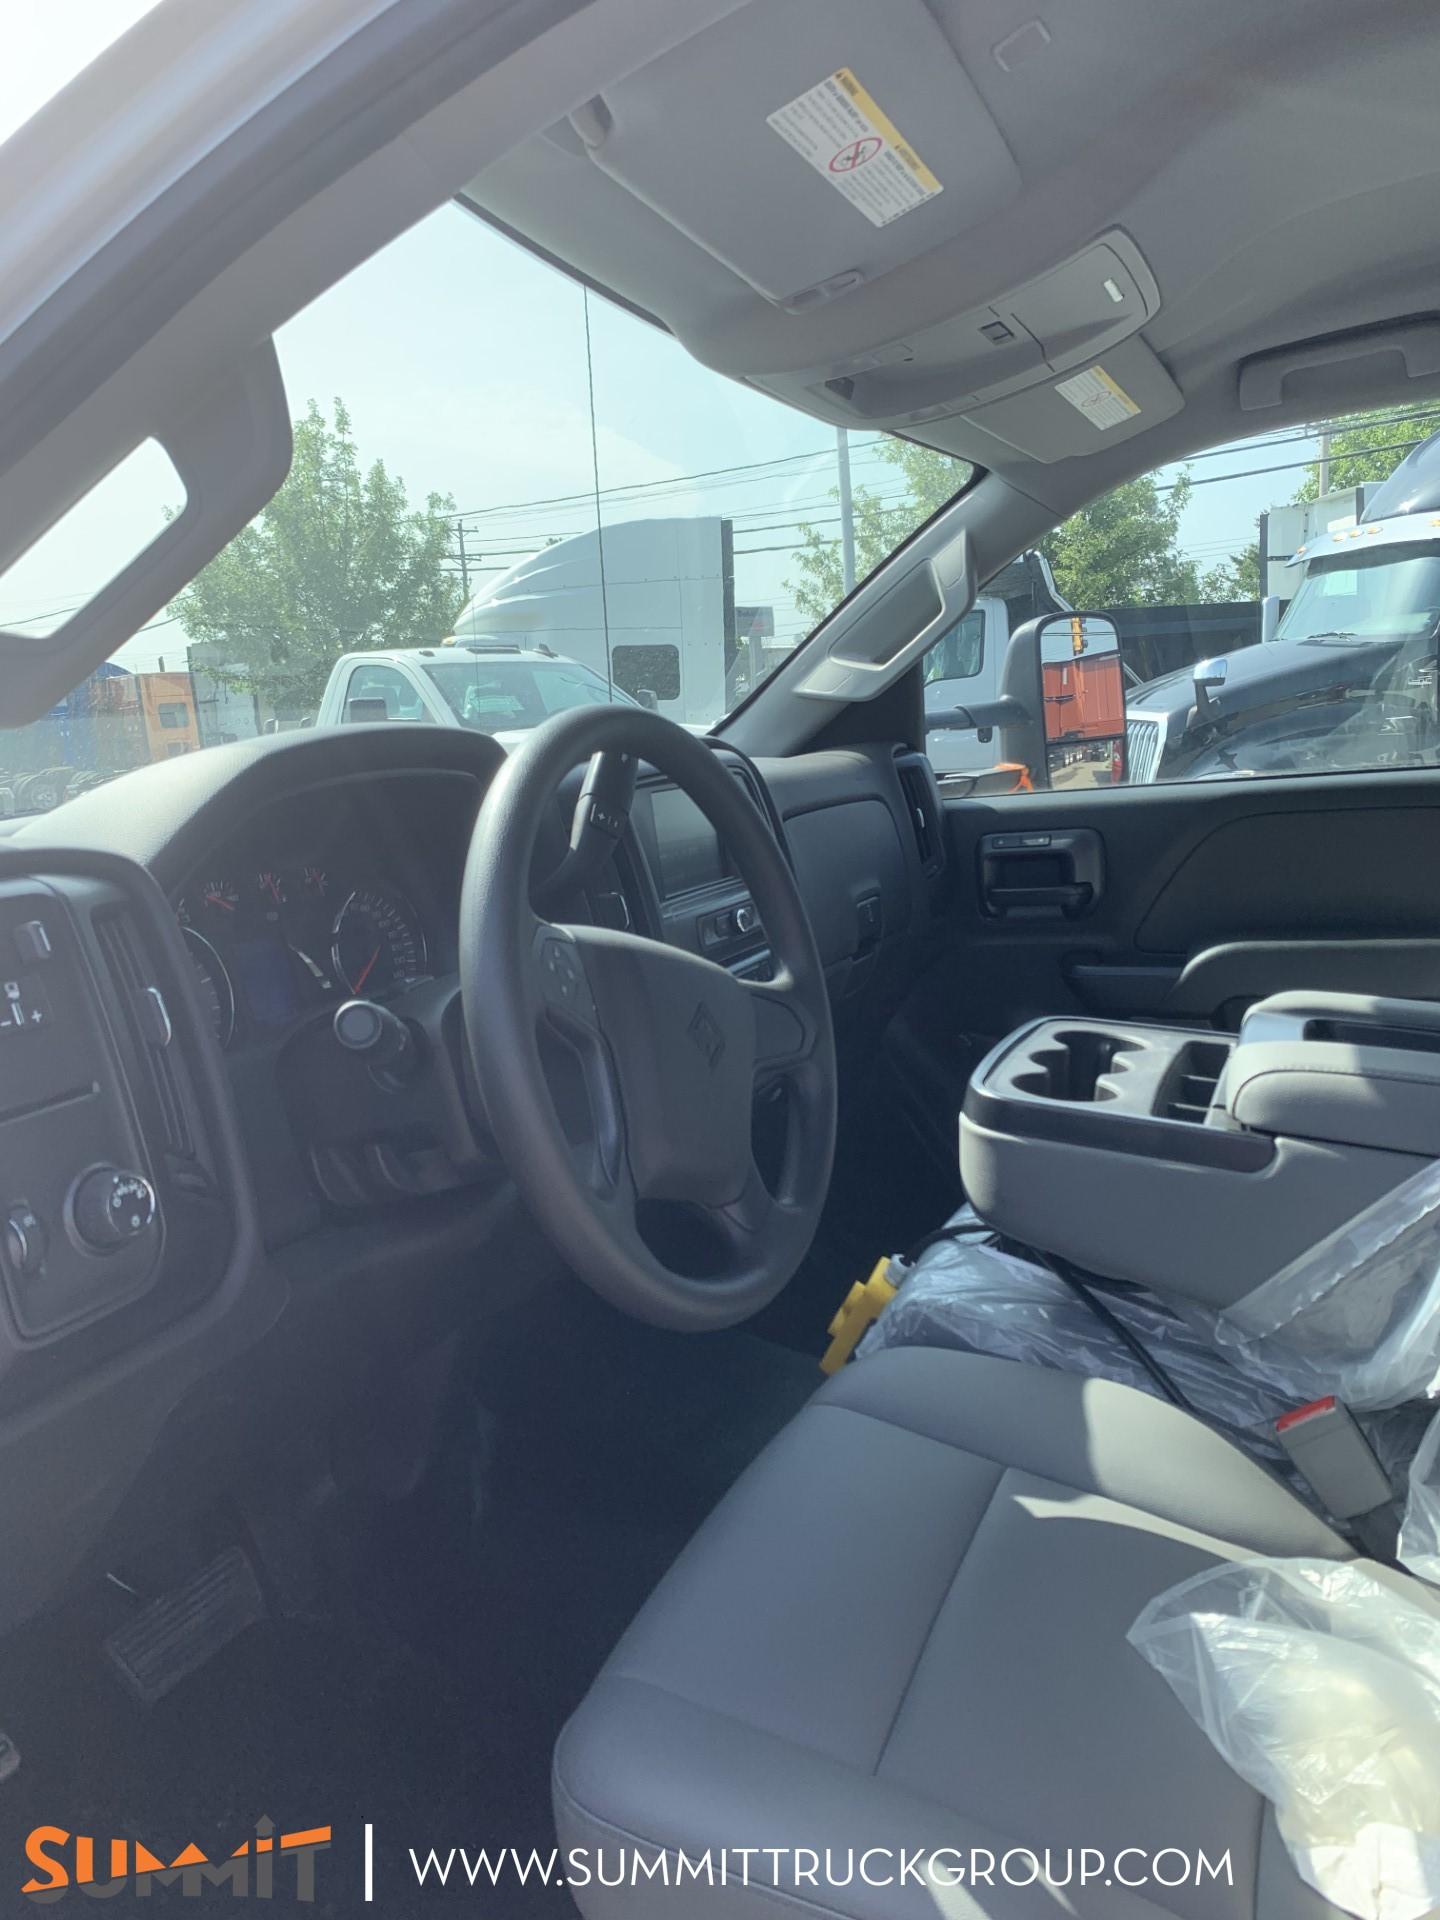 2020 International CV Regular Cab 4x2, Stake Bed #LH442357 - photo 1